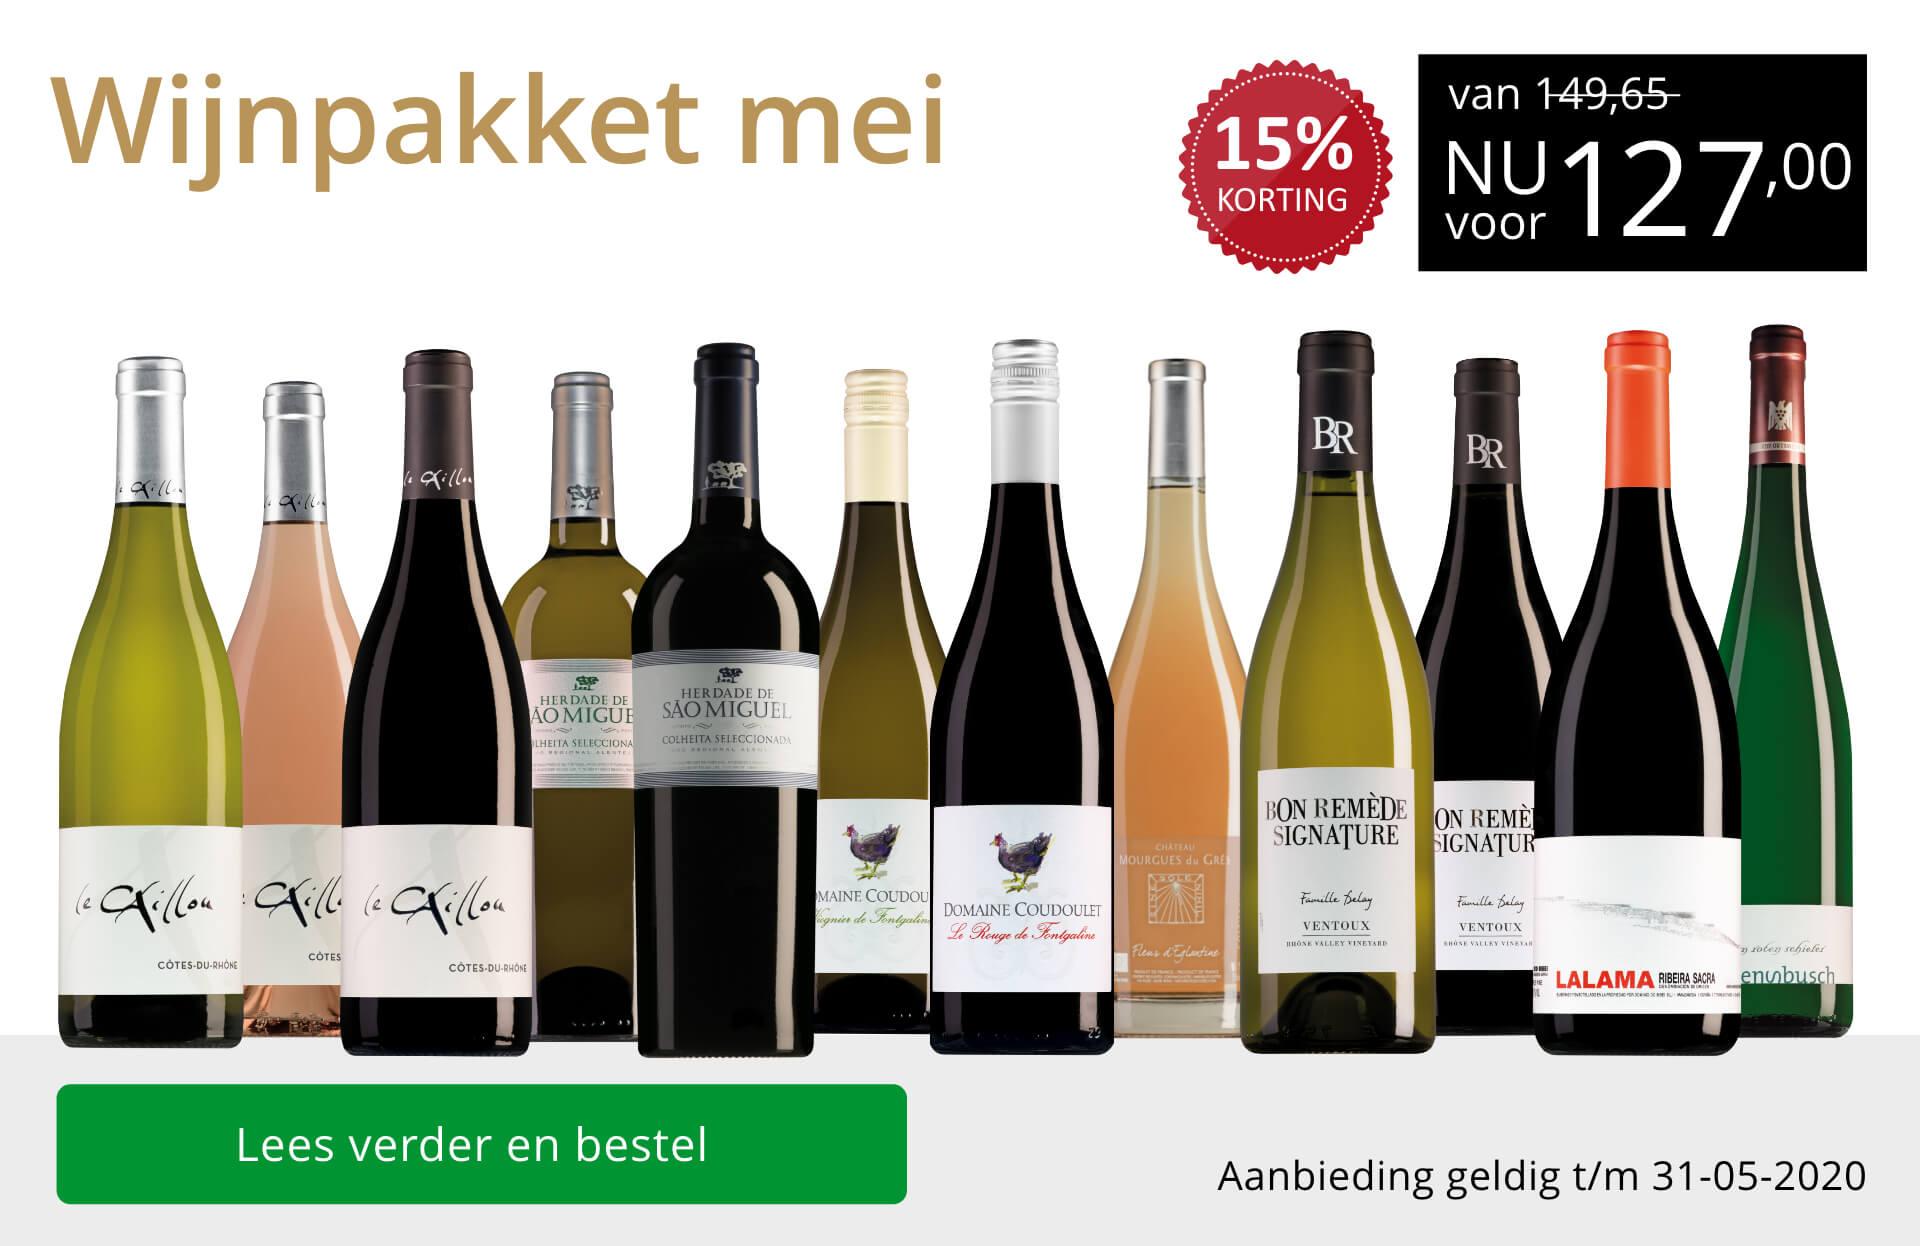 Wijnpakket wijnbericht mei 2020 (127,00) - goud/zwart